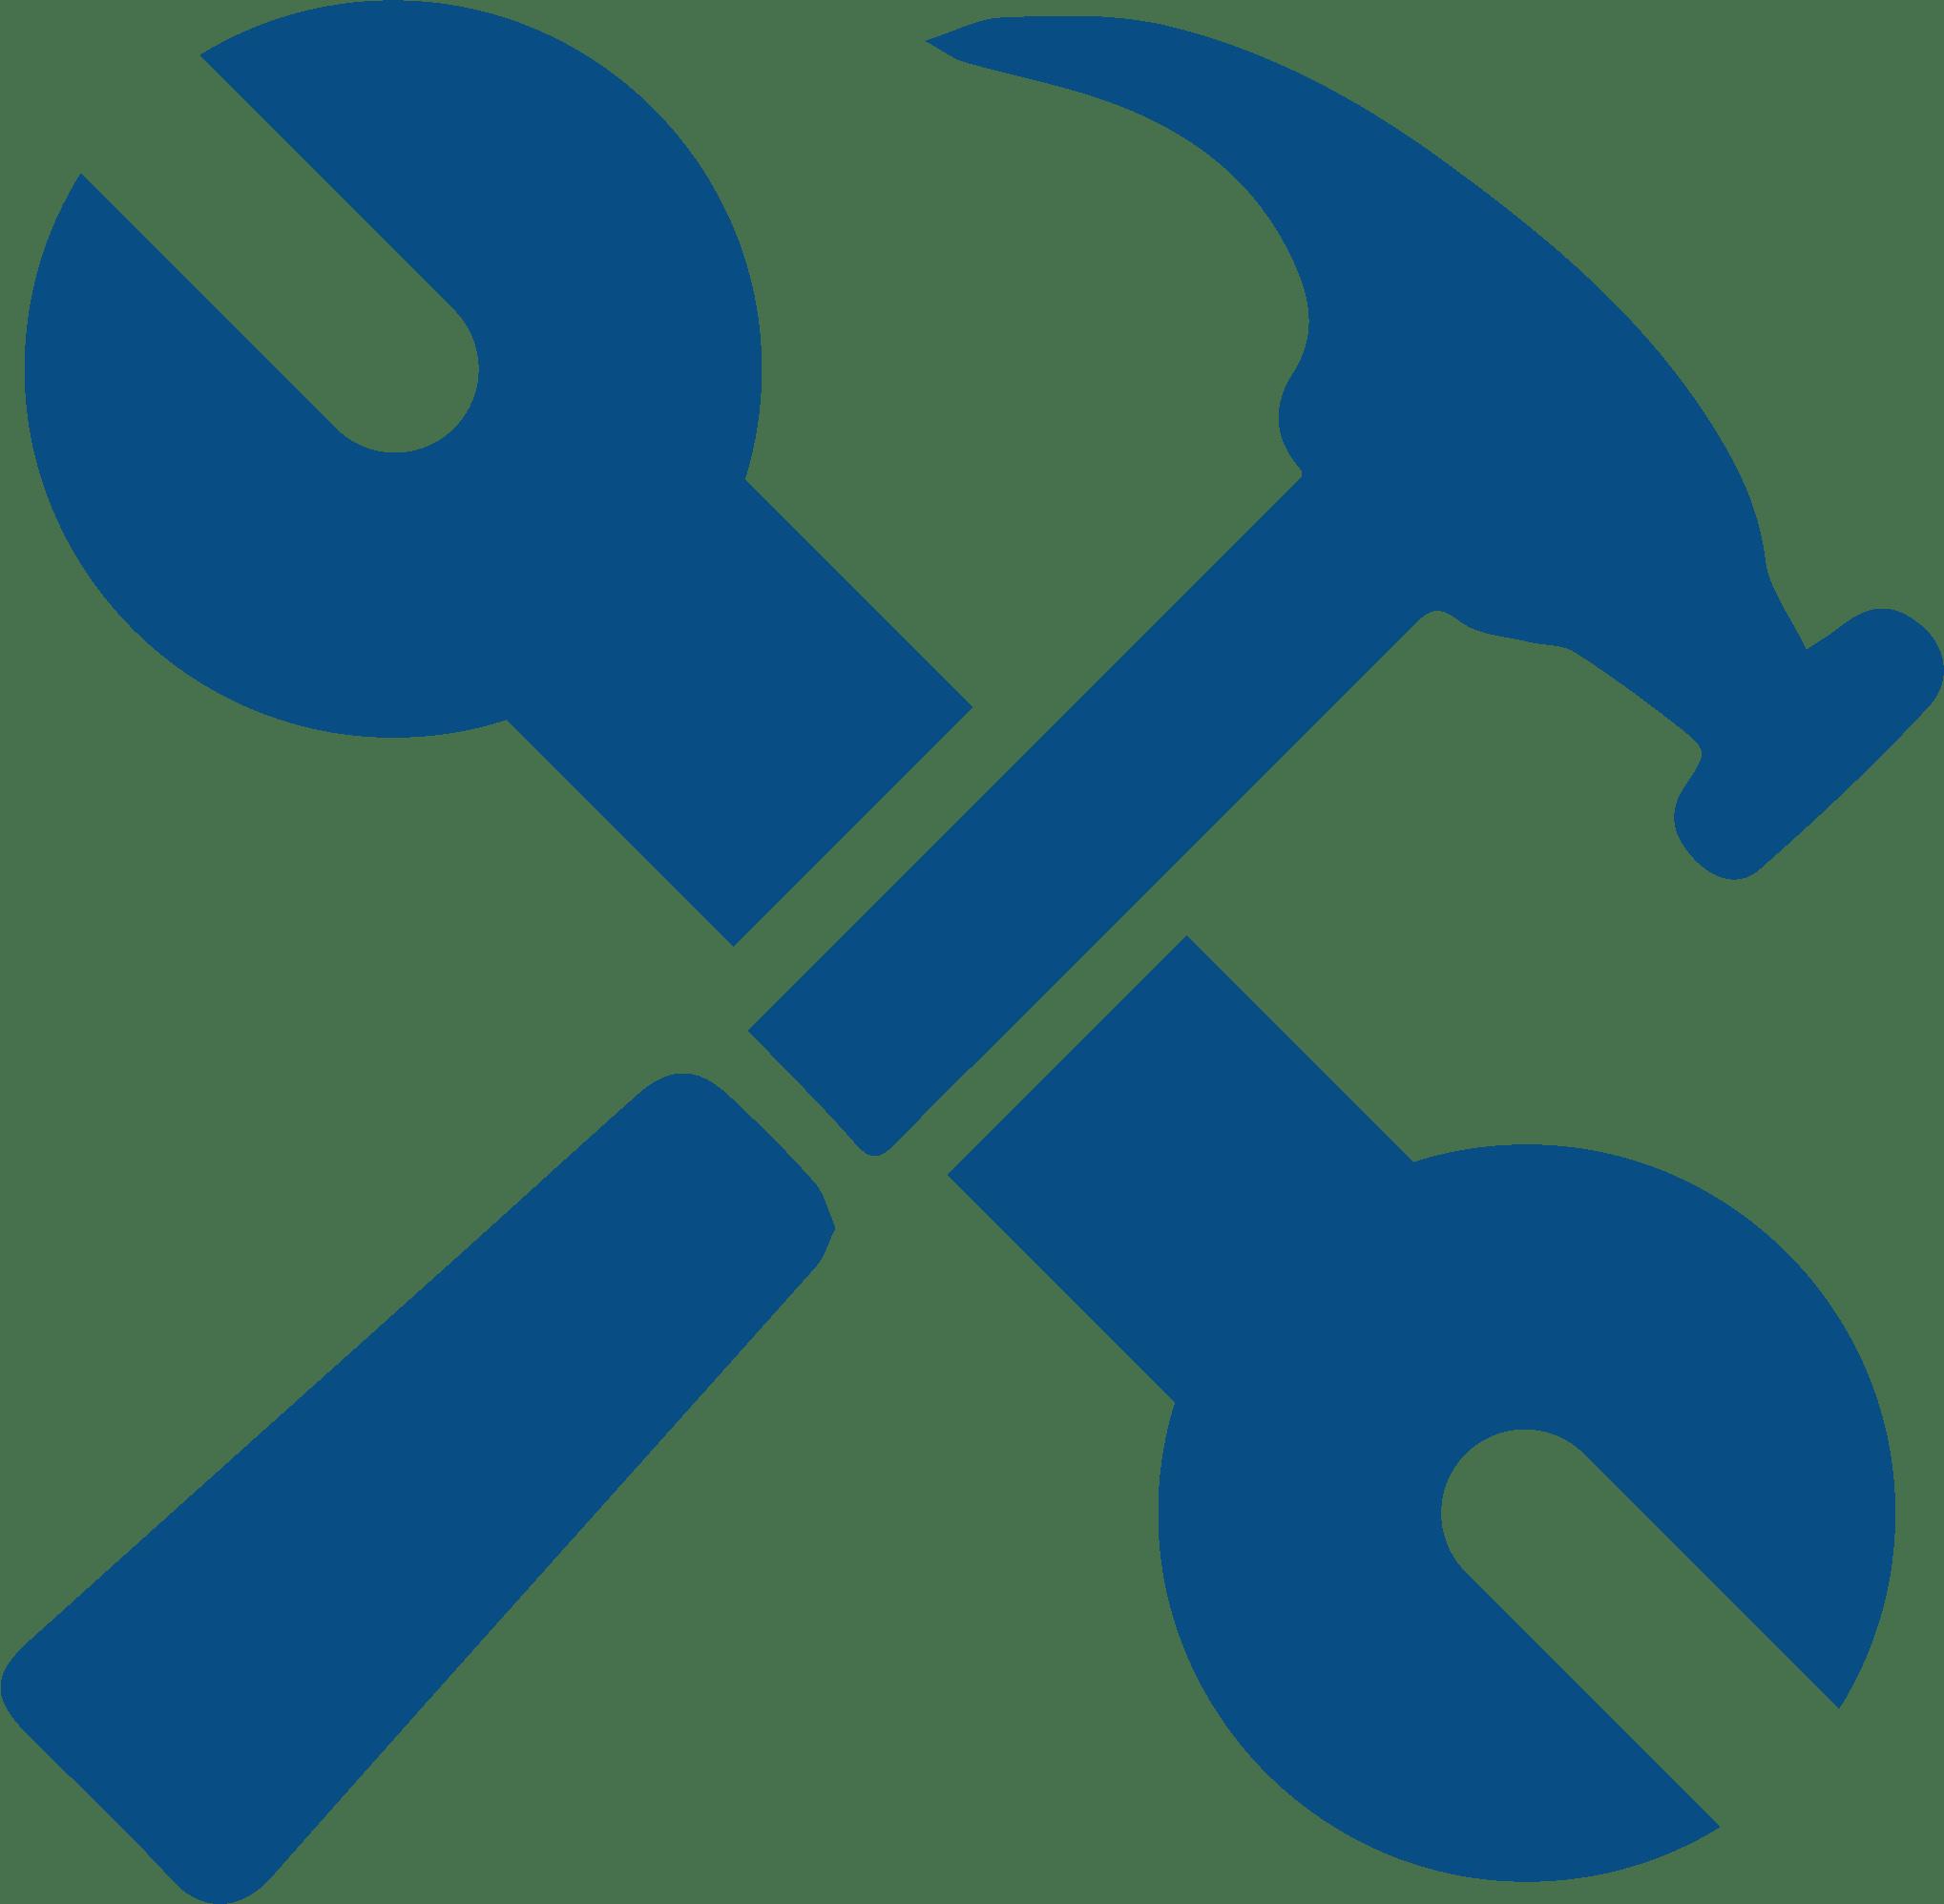 Icon ข้อดีลวดหนามซิงค์อลู ติดตั้งง่าย